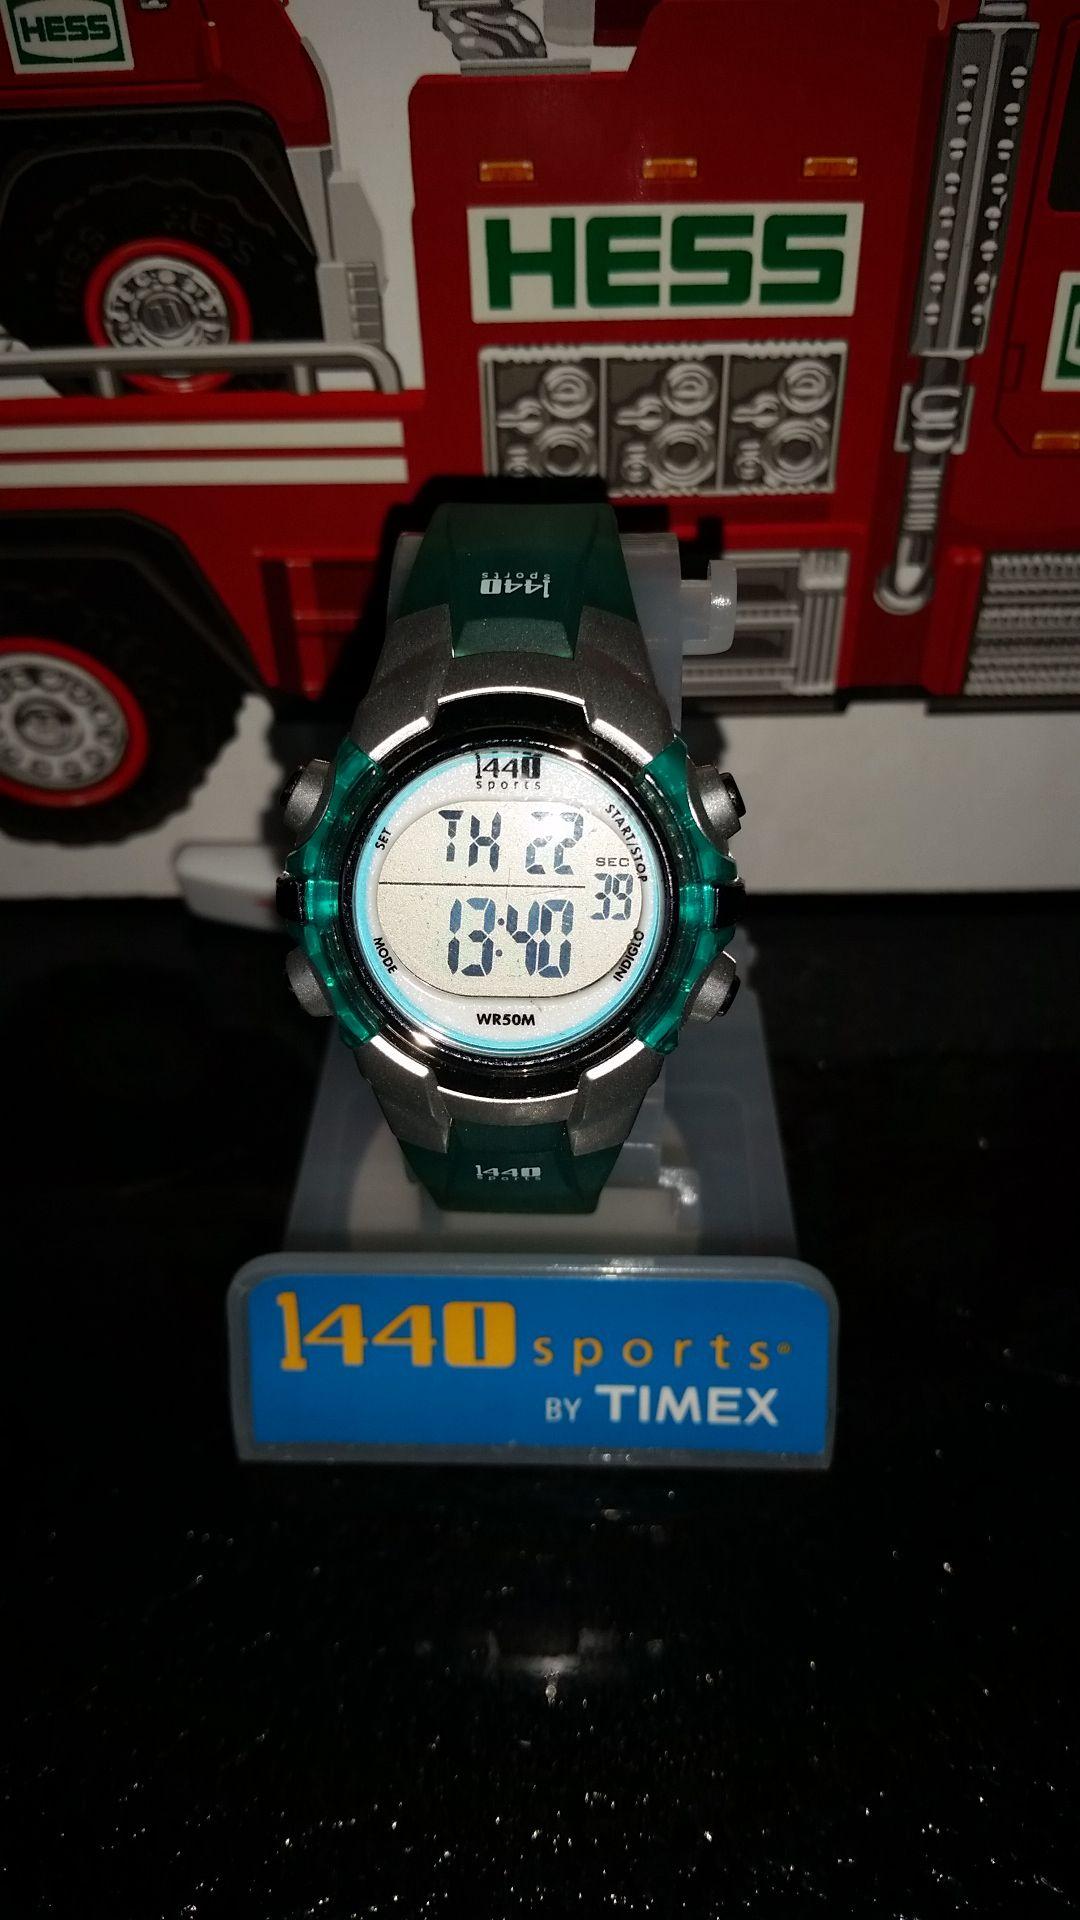 1440 Sports by Timex